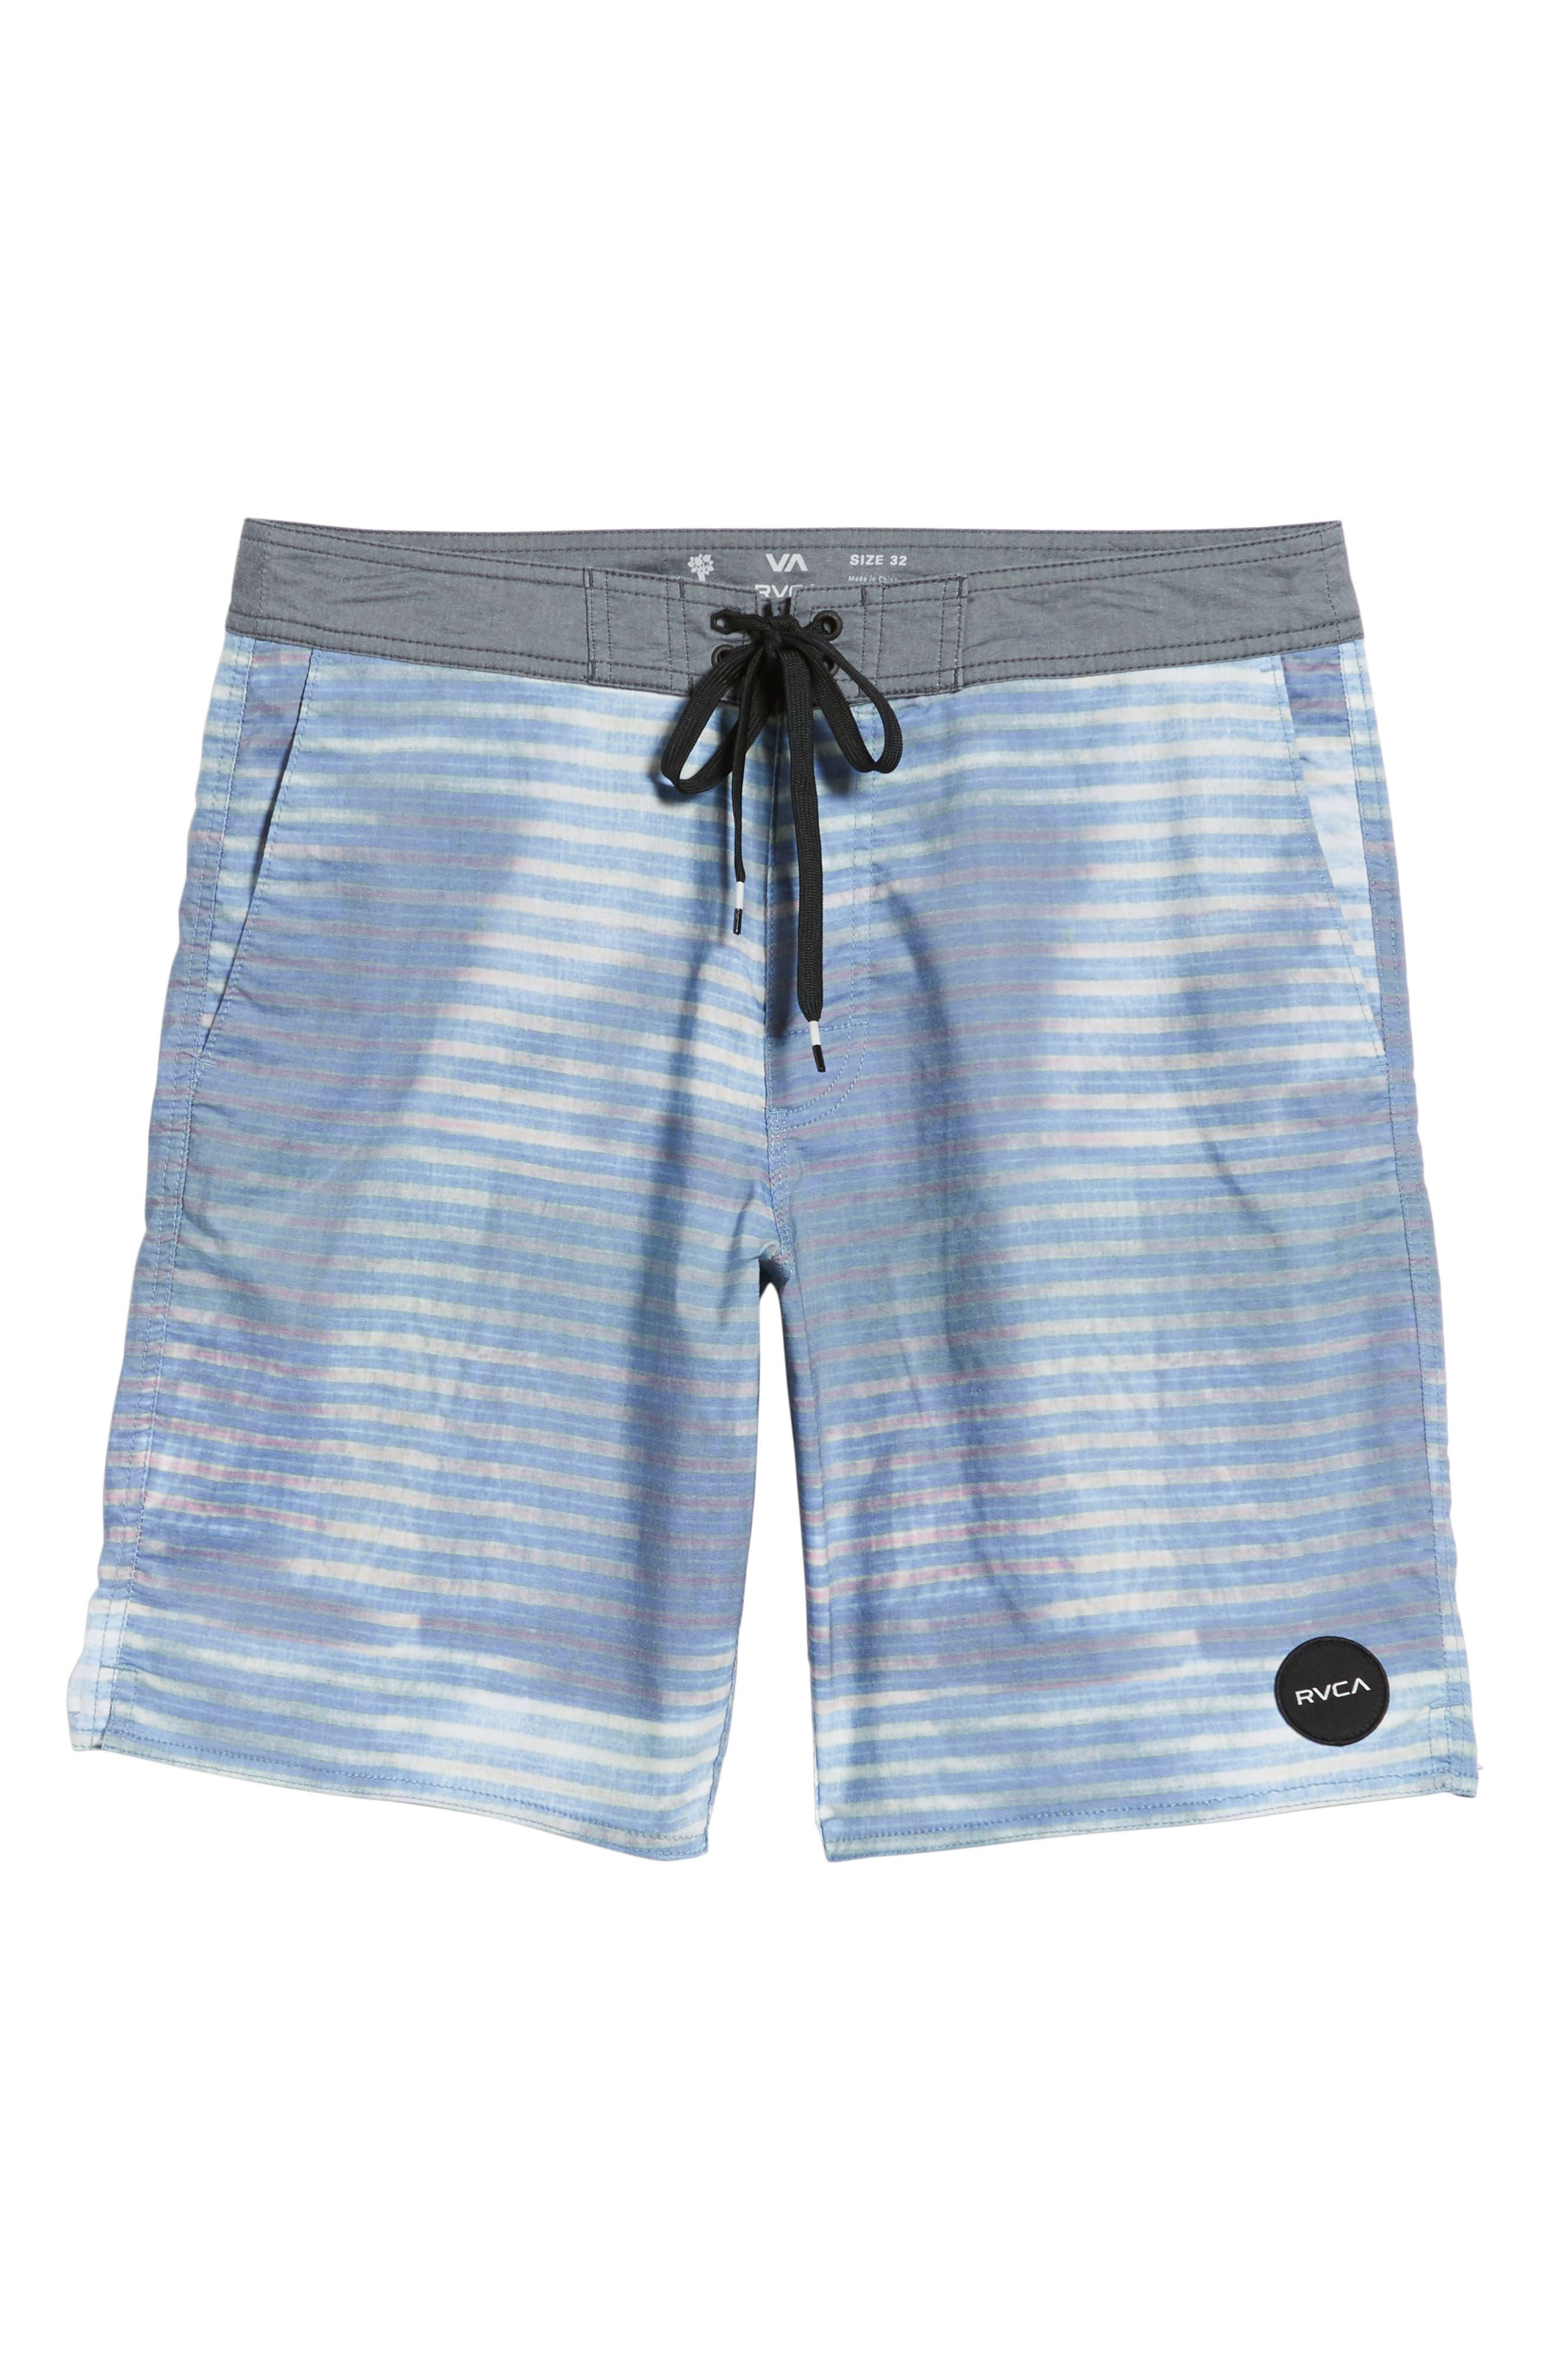 Boppa Stripe Swim Trunks,                             Alternate thumbnail 6, color,                             402